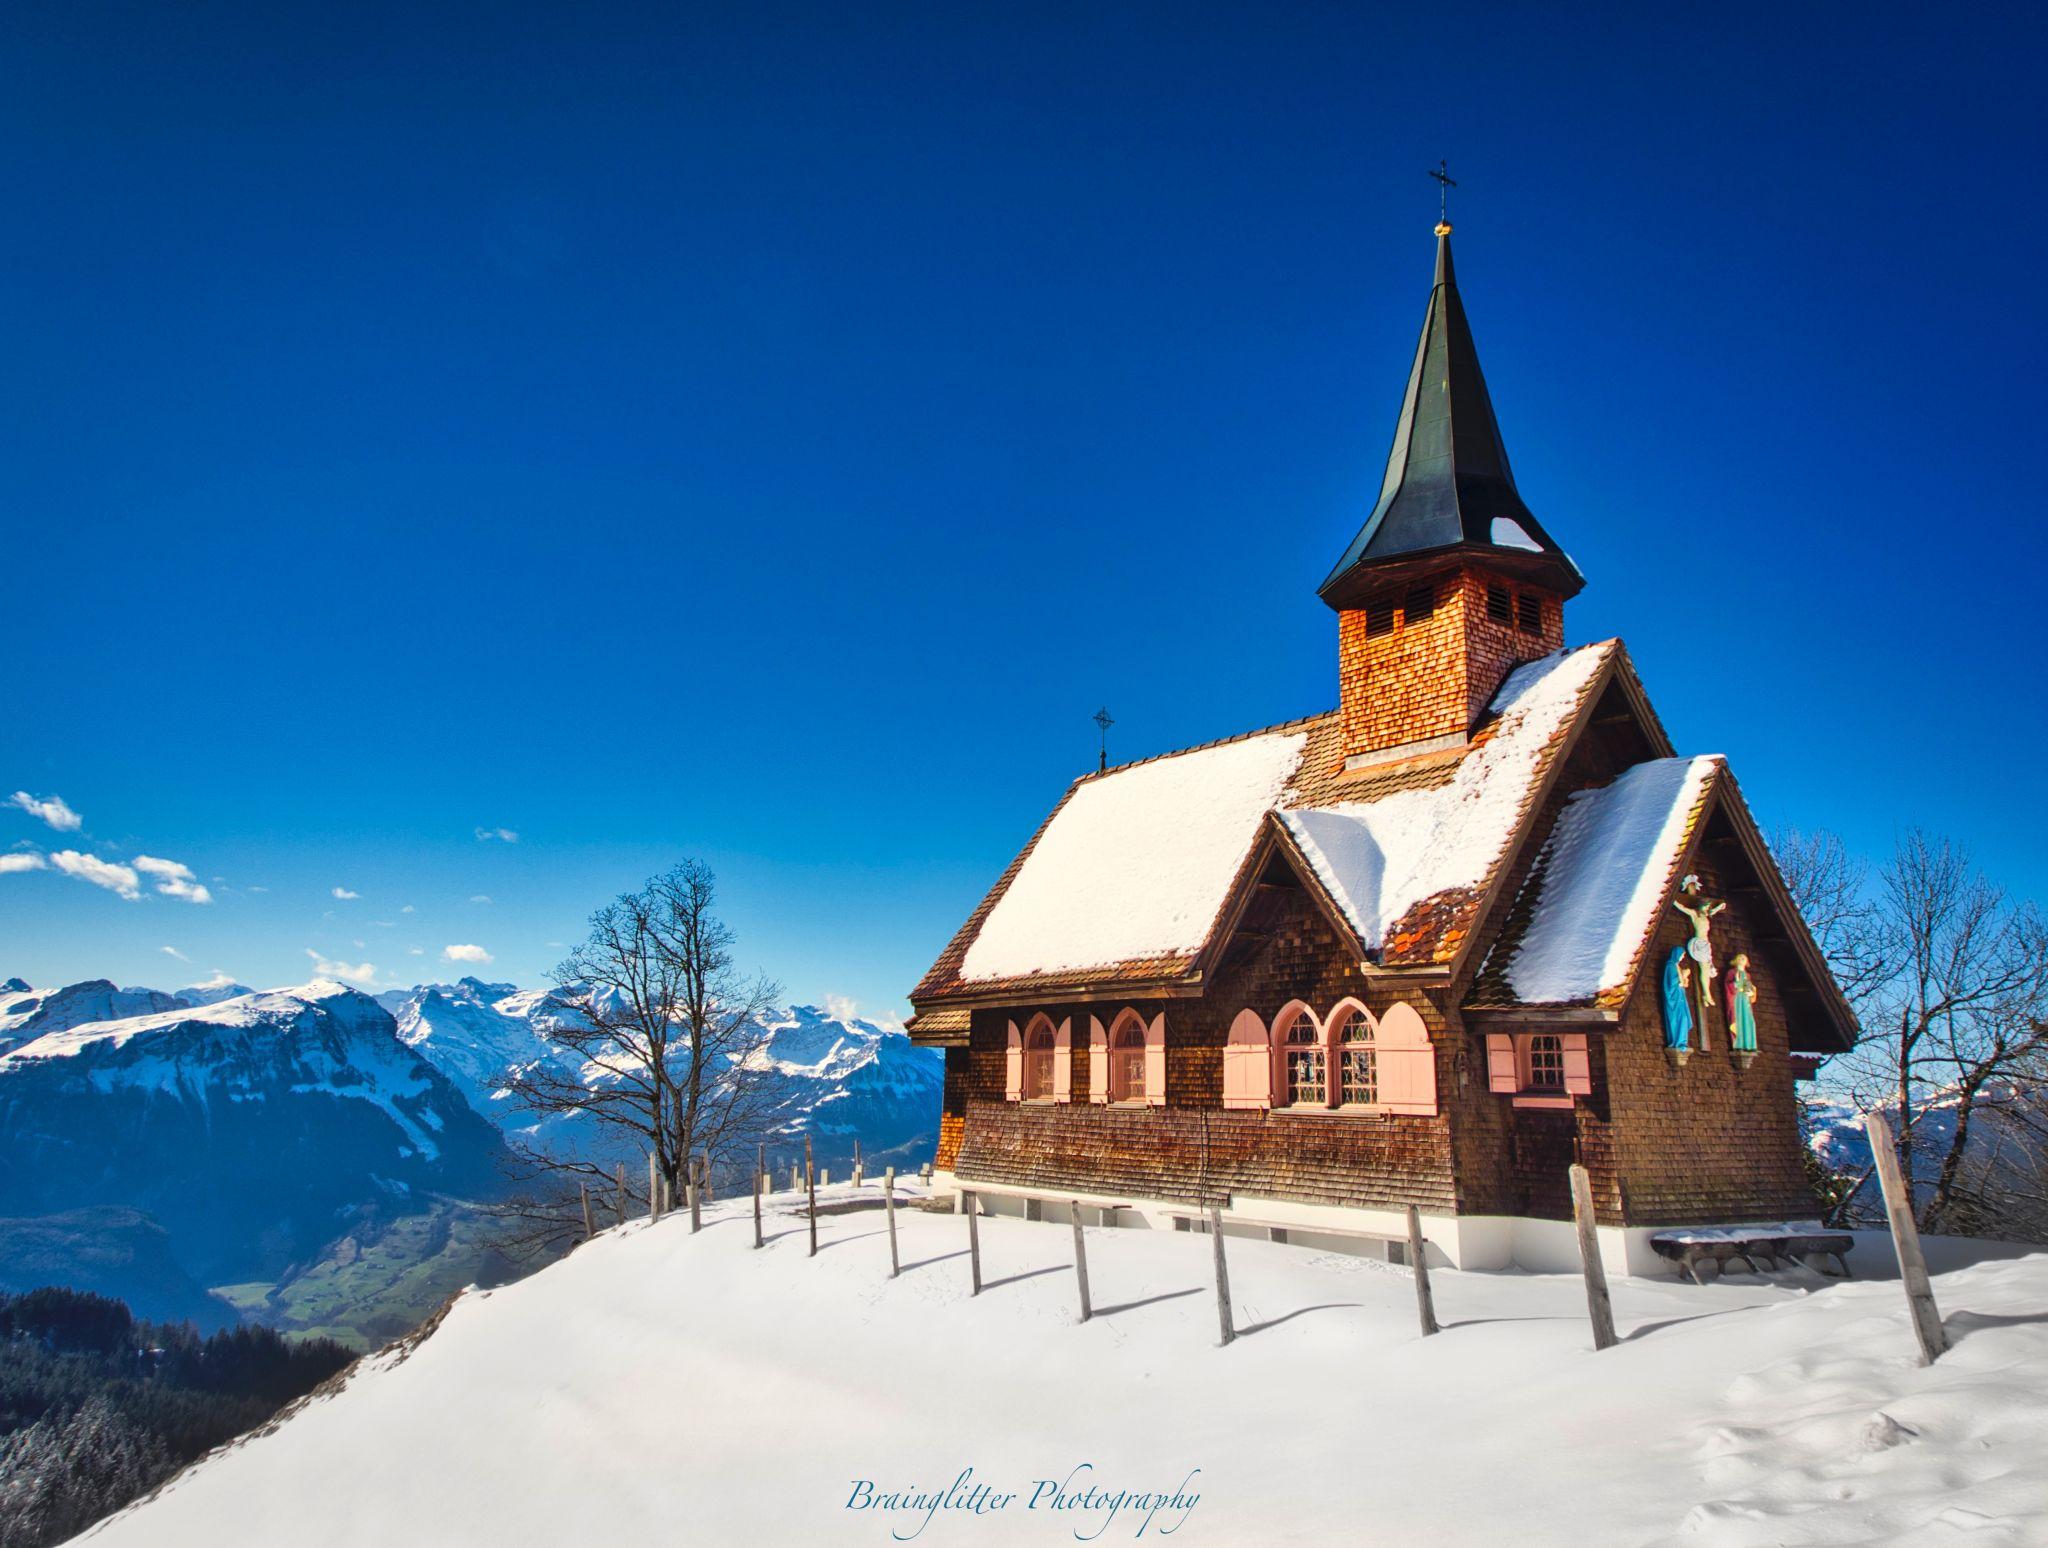 Kapelle Haggenegg, Switzerland